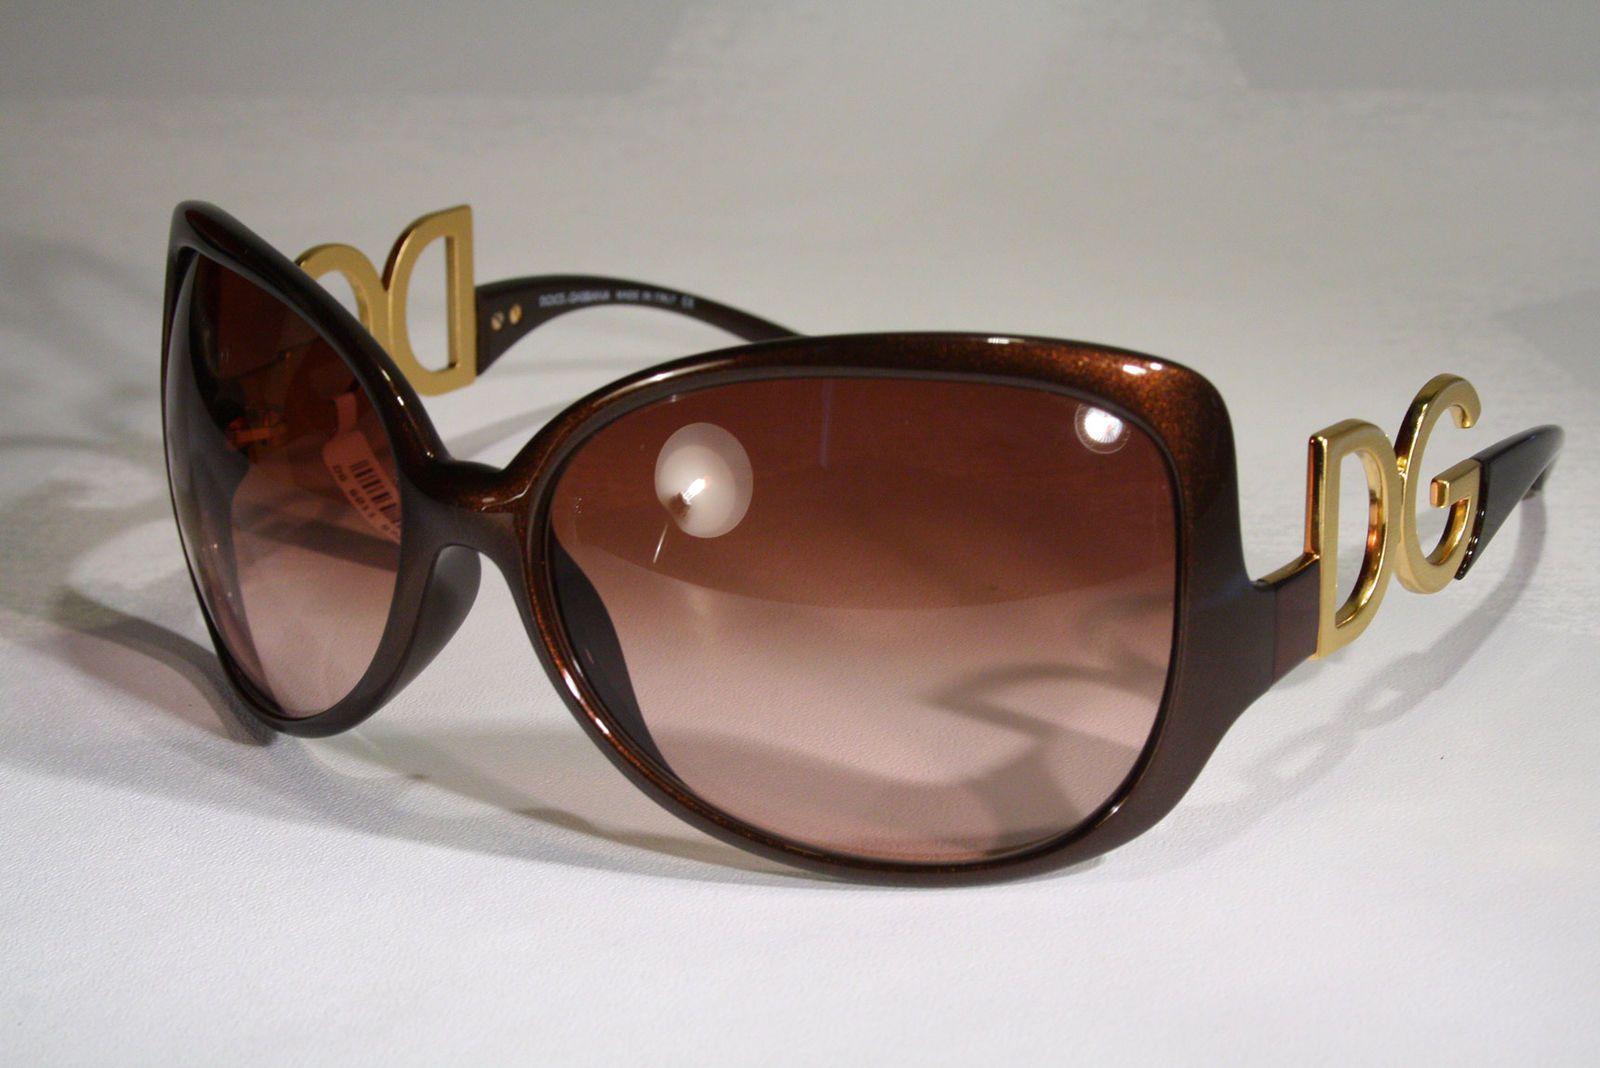 82303d0a5ca DOLCE   GABBANA D G DG6011 Women s Authentic Designer Sunglasses    Accessories   eBay (RipVanW)